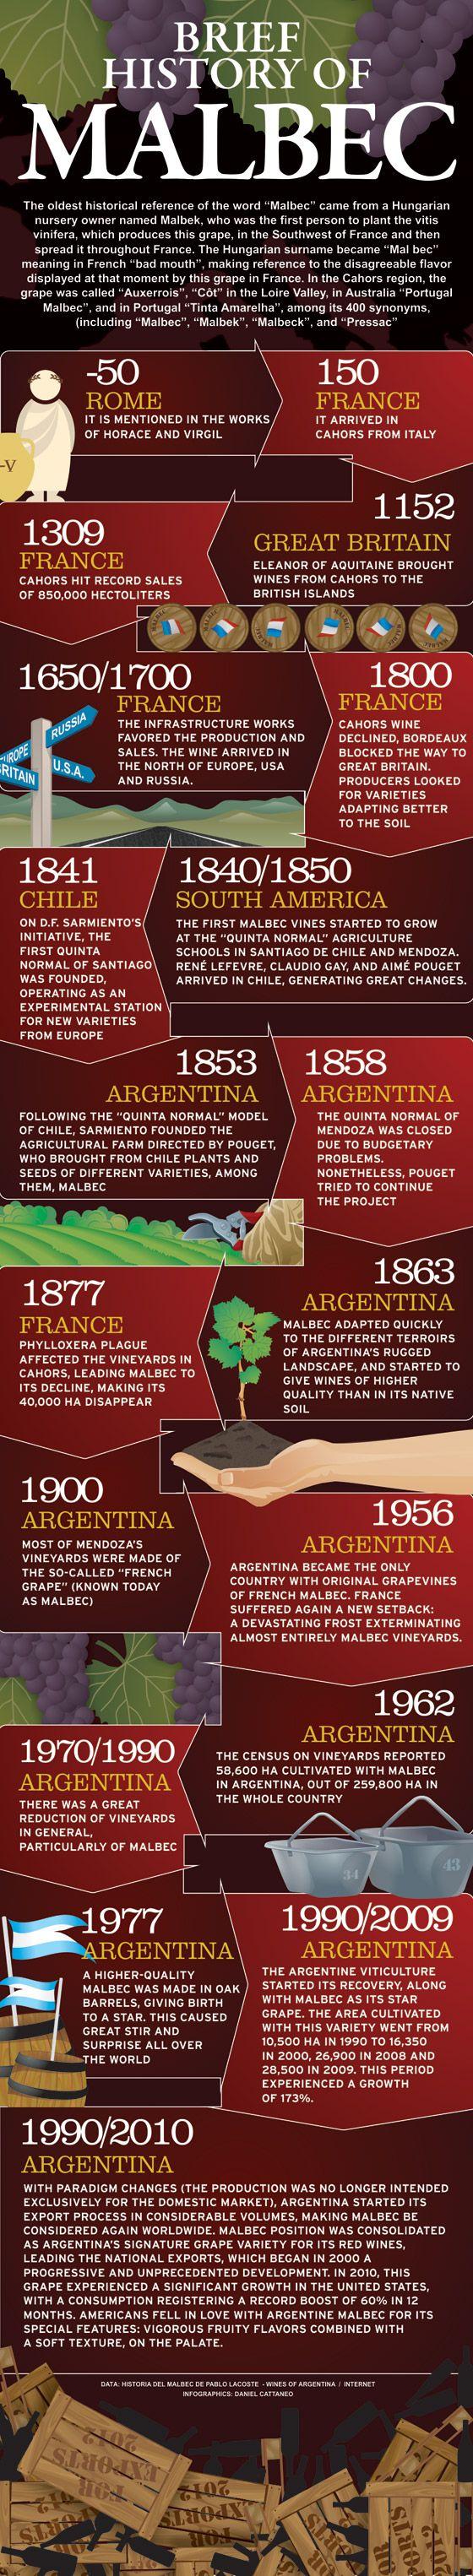 Historia Concisa de la uva Malbec   WineSur - October 9, 2013 #vino #wine